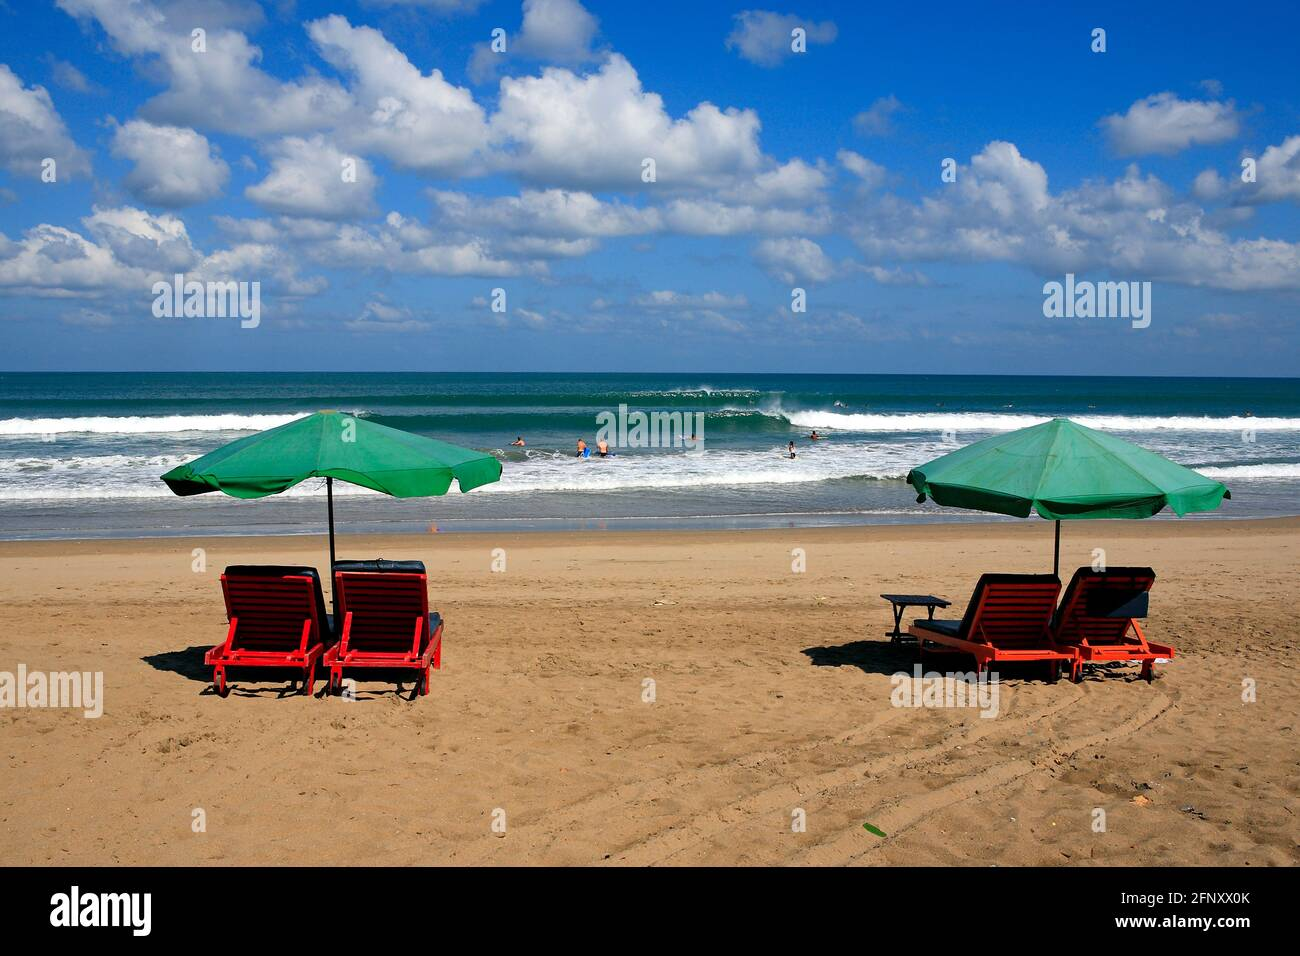 beach-chairs-with-umbrellas-kuta-legian-beach-bali-indonesia-2FNXX0K.jpg